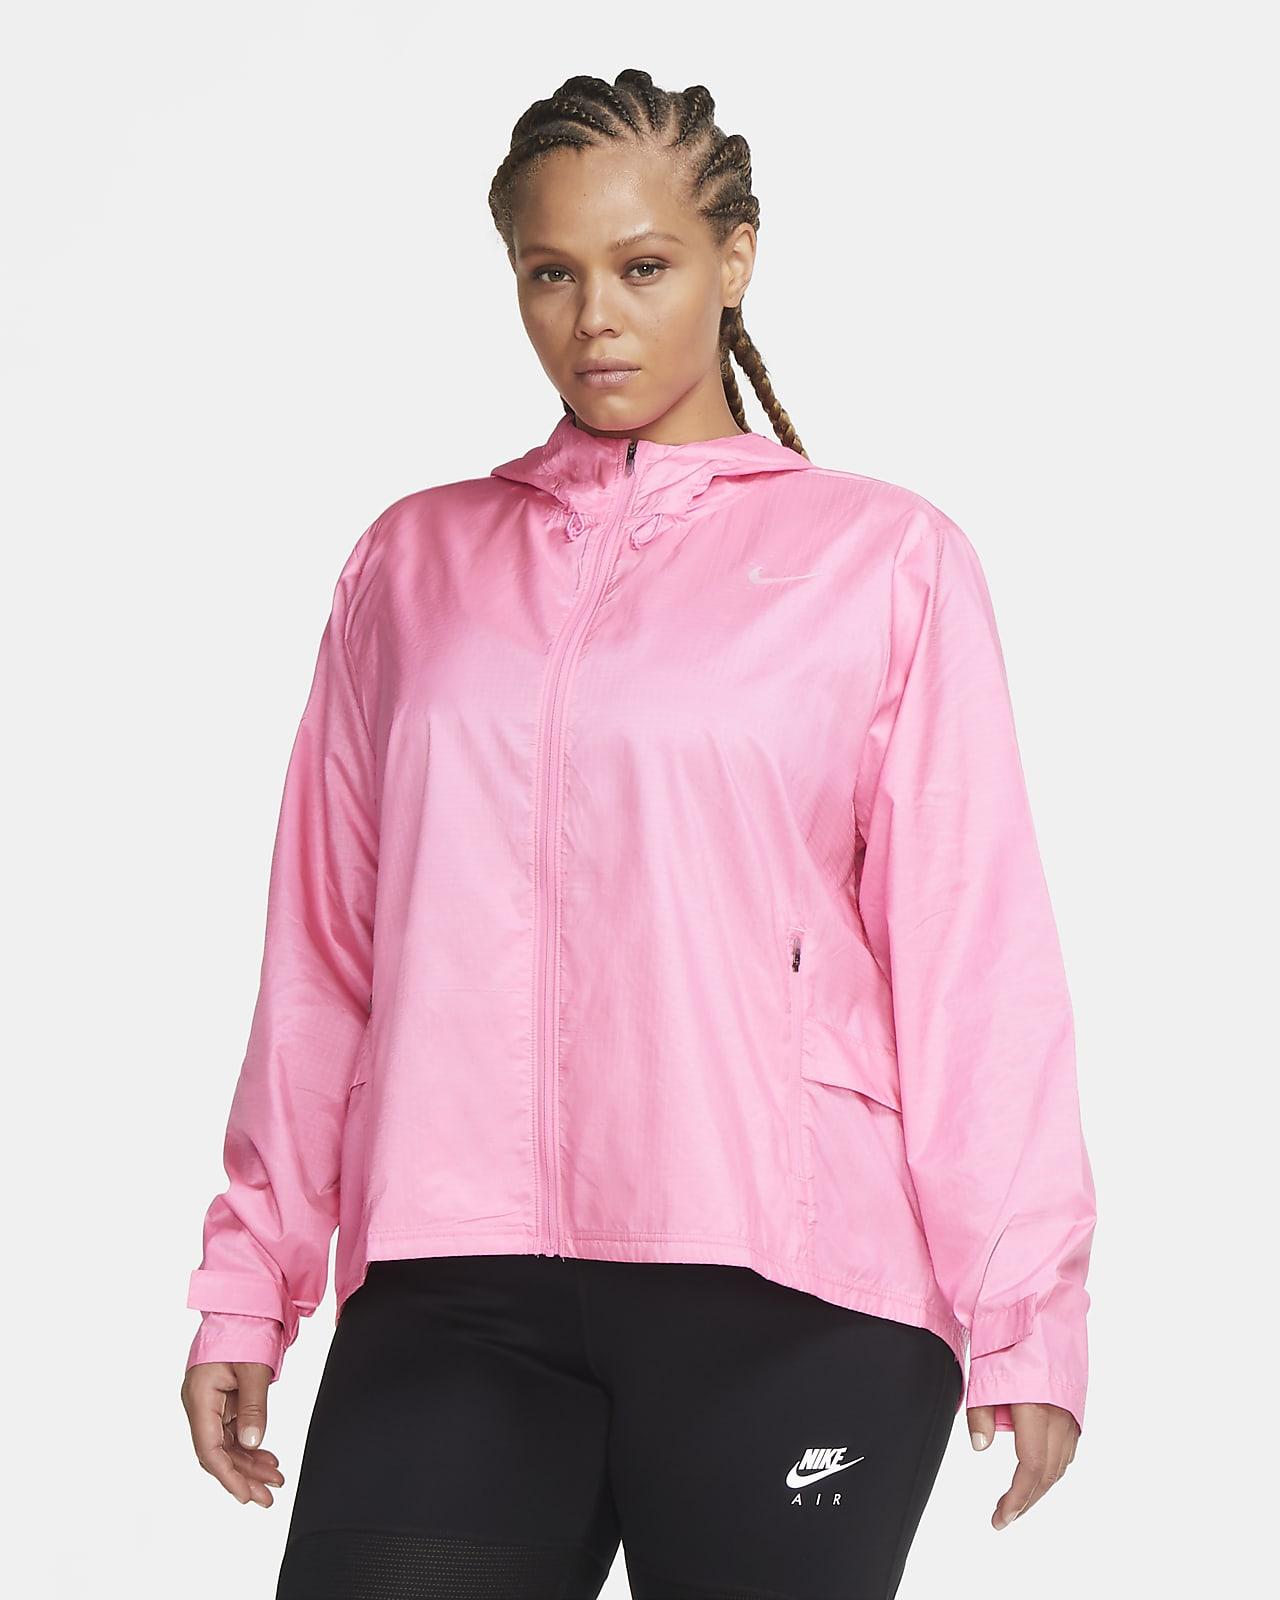 Chamarra de running para mujer talla grande Nike Essential